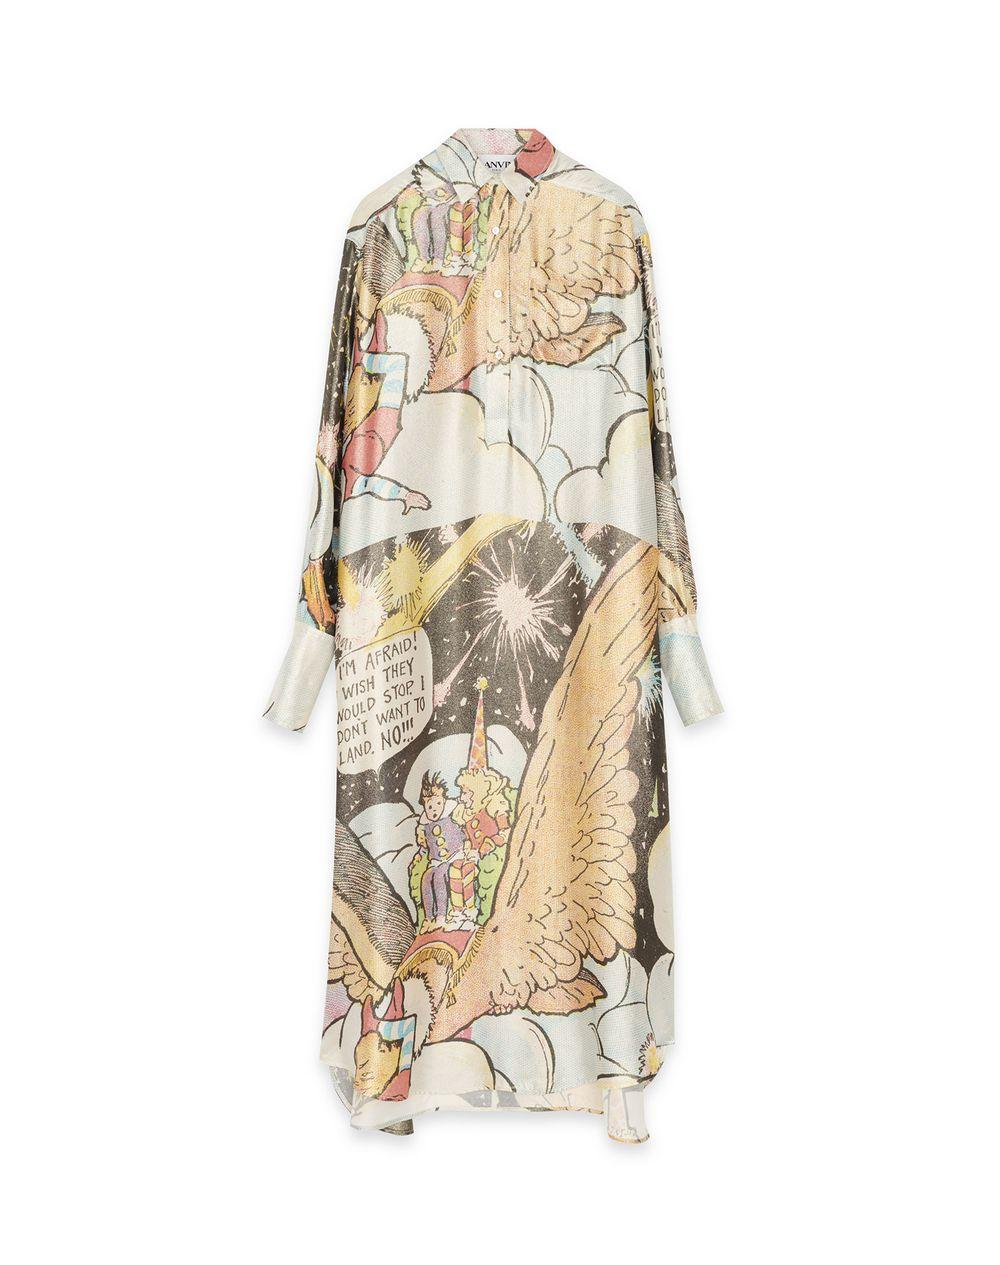 LITTLE NEMO PRINT SHIRT DRESS - Lanvin